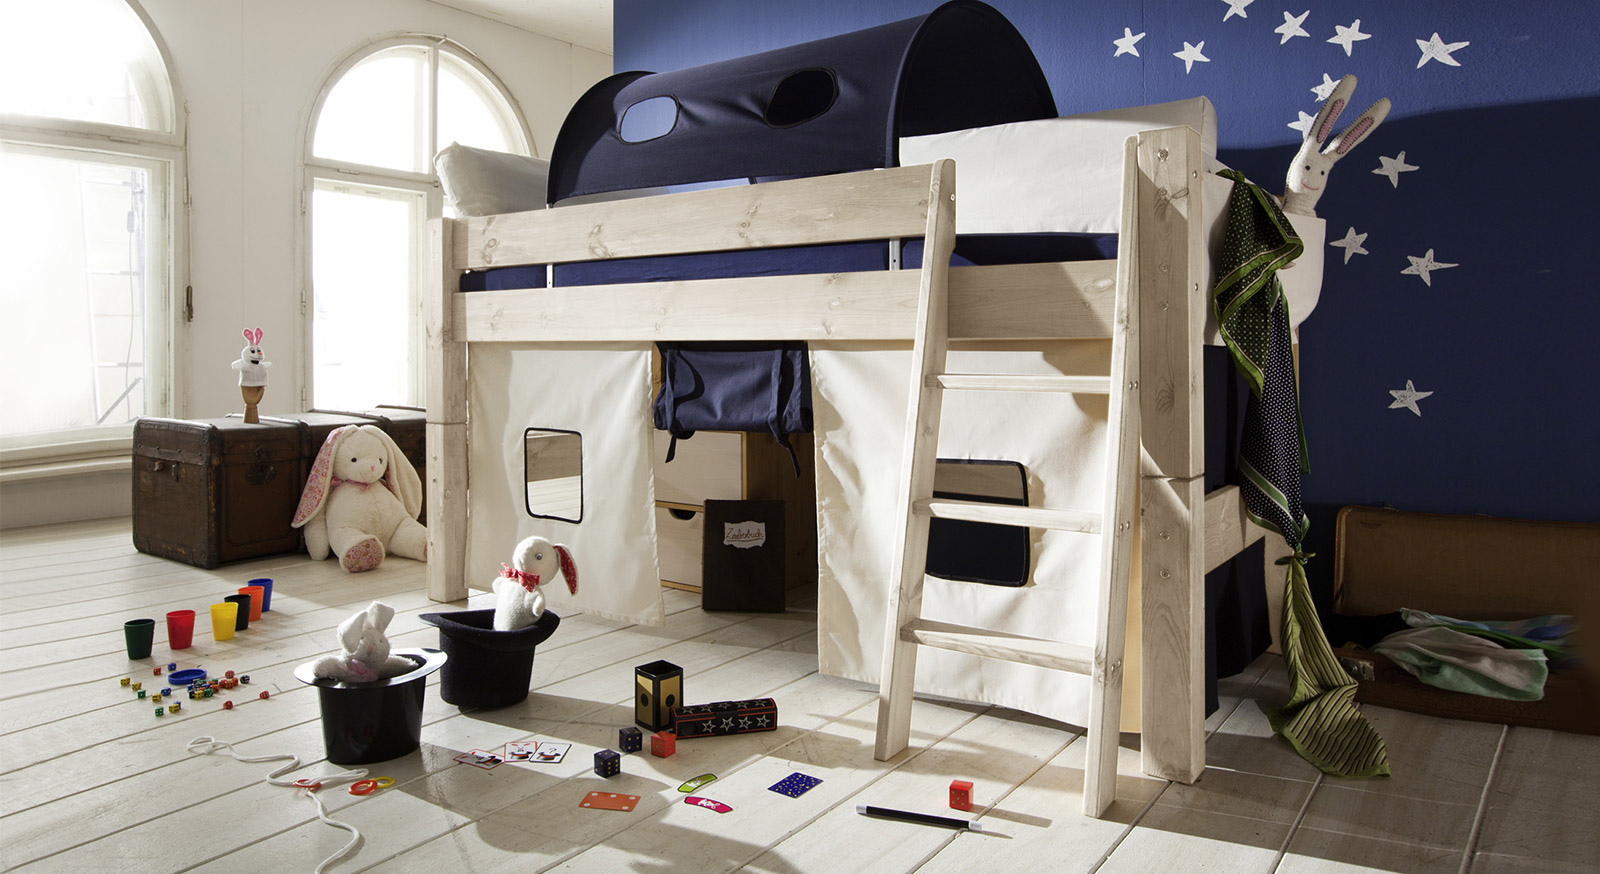 Hochwertiges Mini-Hochbett Kids Dreams in Kiefer weiß